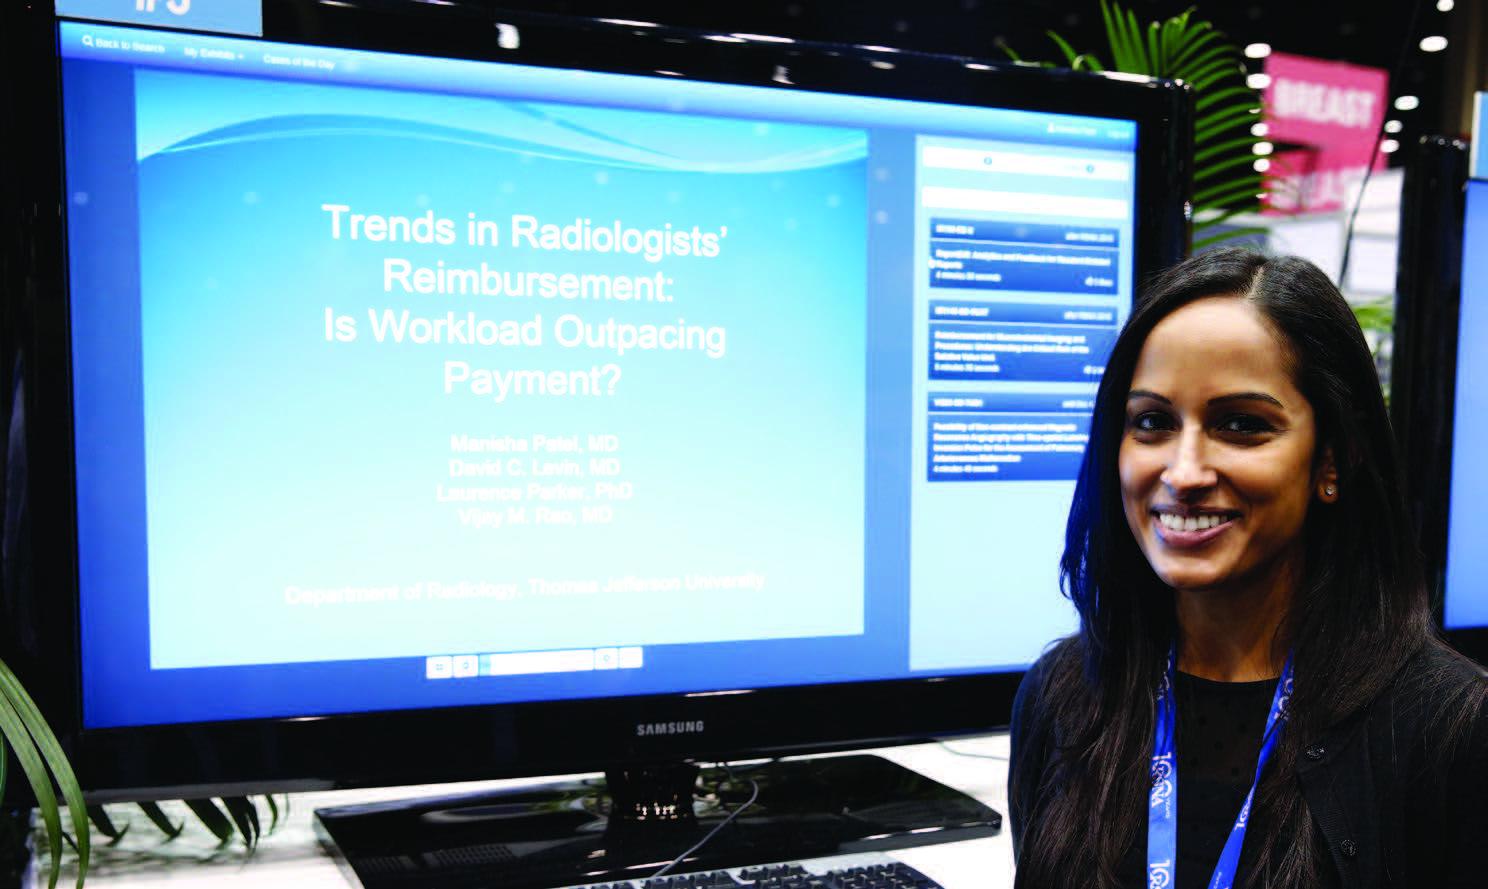 Manisha Patel, M.D., presented an analysis of reimbursement trends at RSNA 2015.